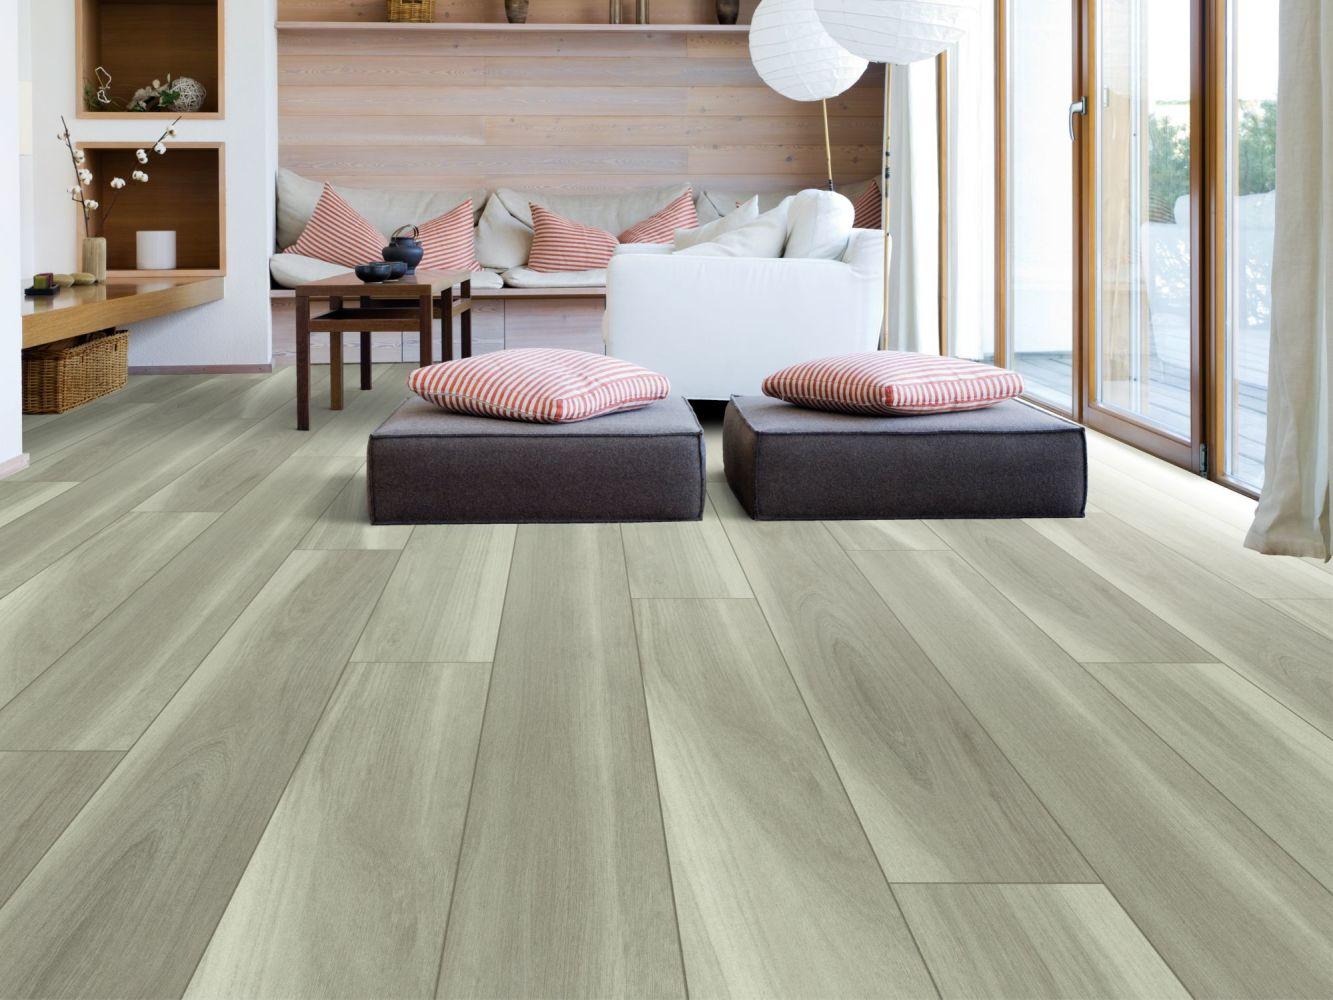 Shaw Floors Reality Homes Lava Beds Misty Oak 05008_110RH